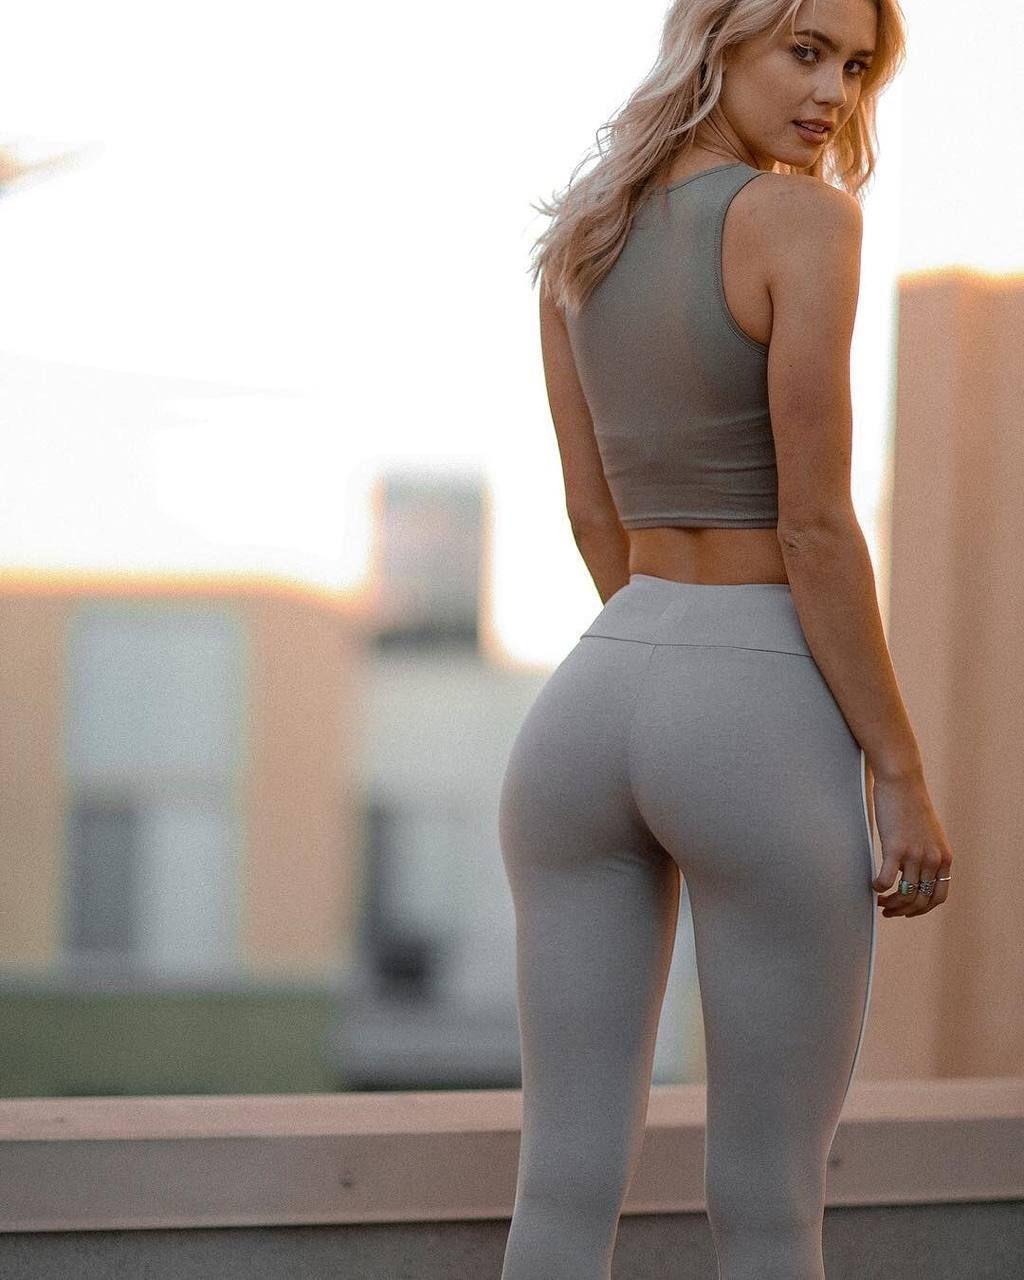 This phrase yoga pants girls interracial